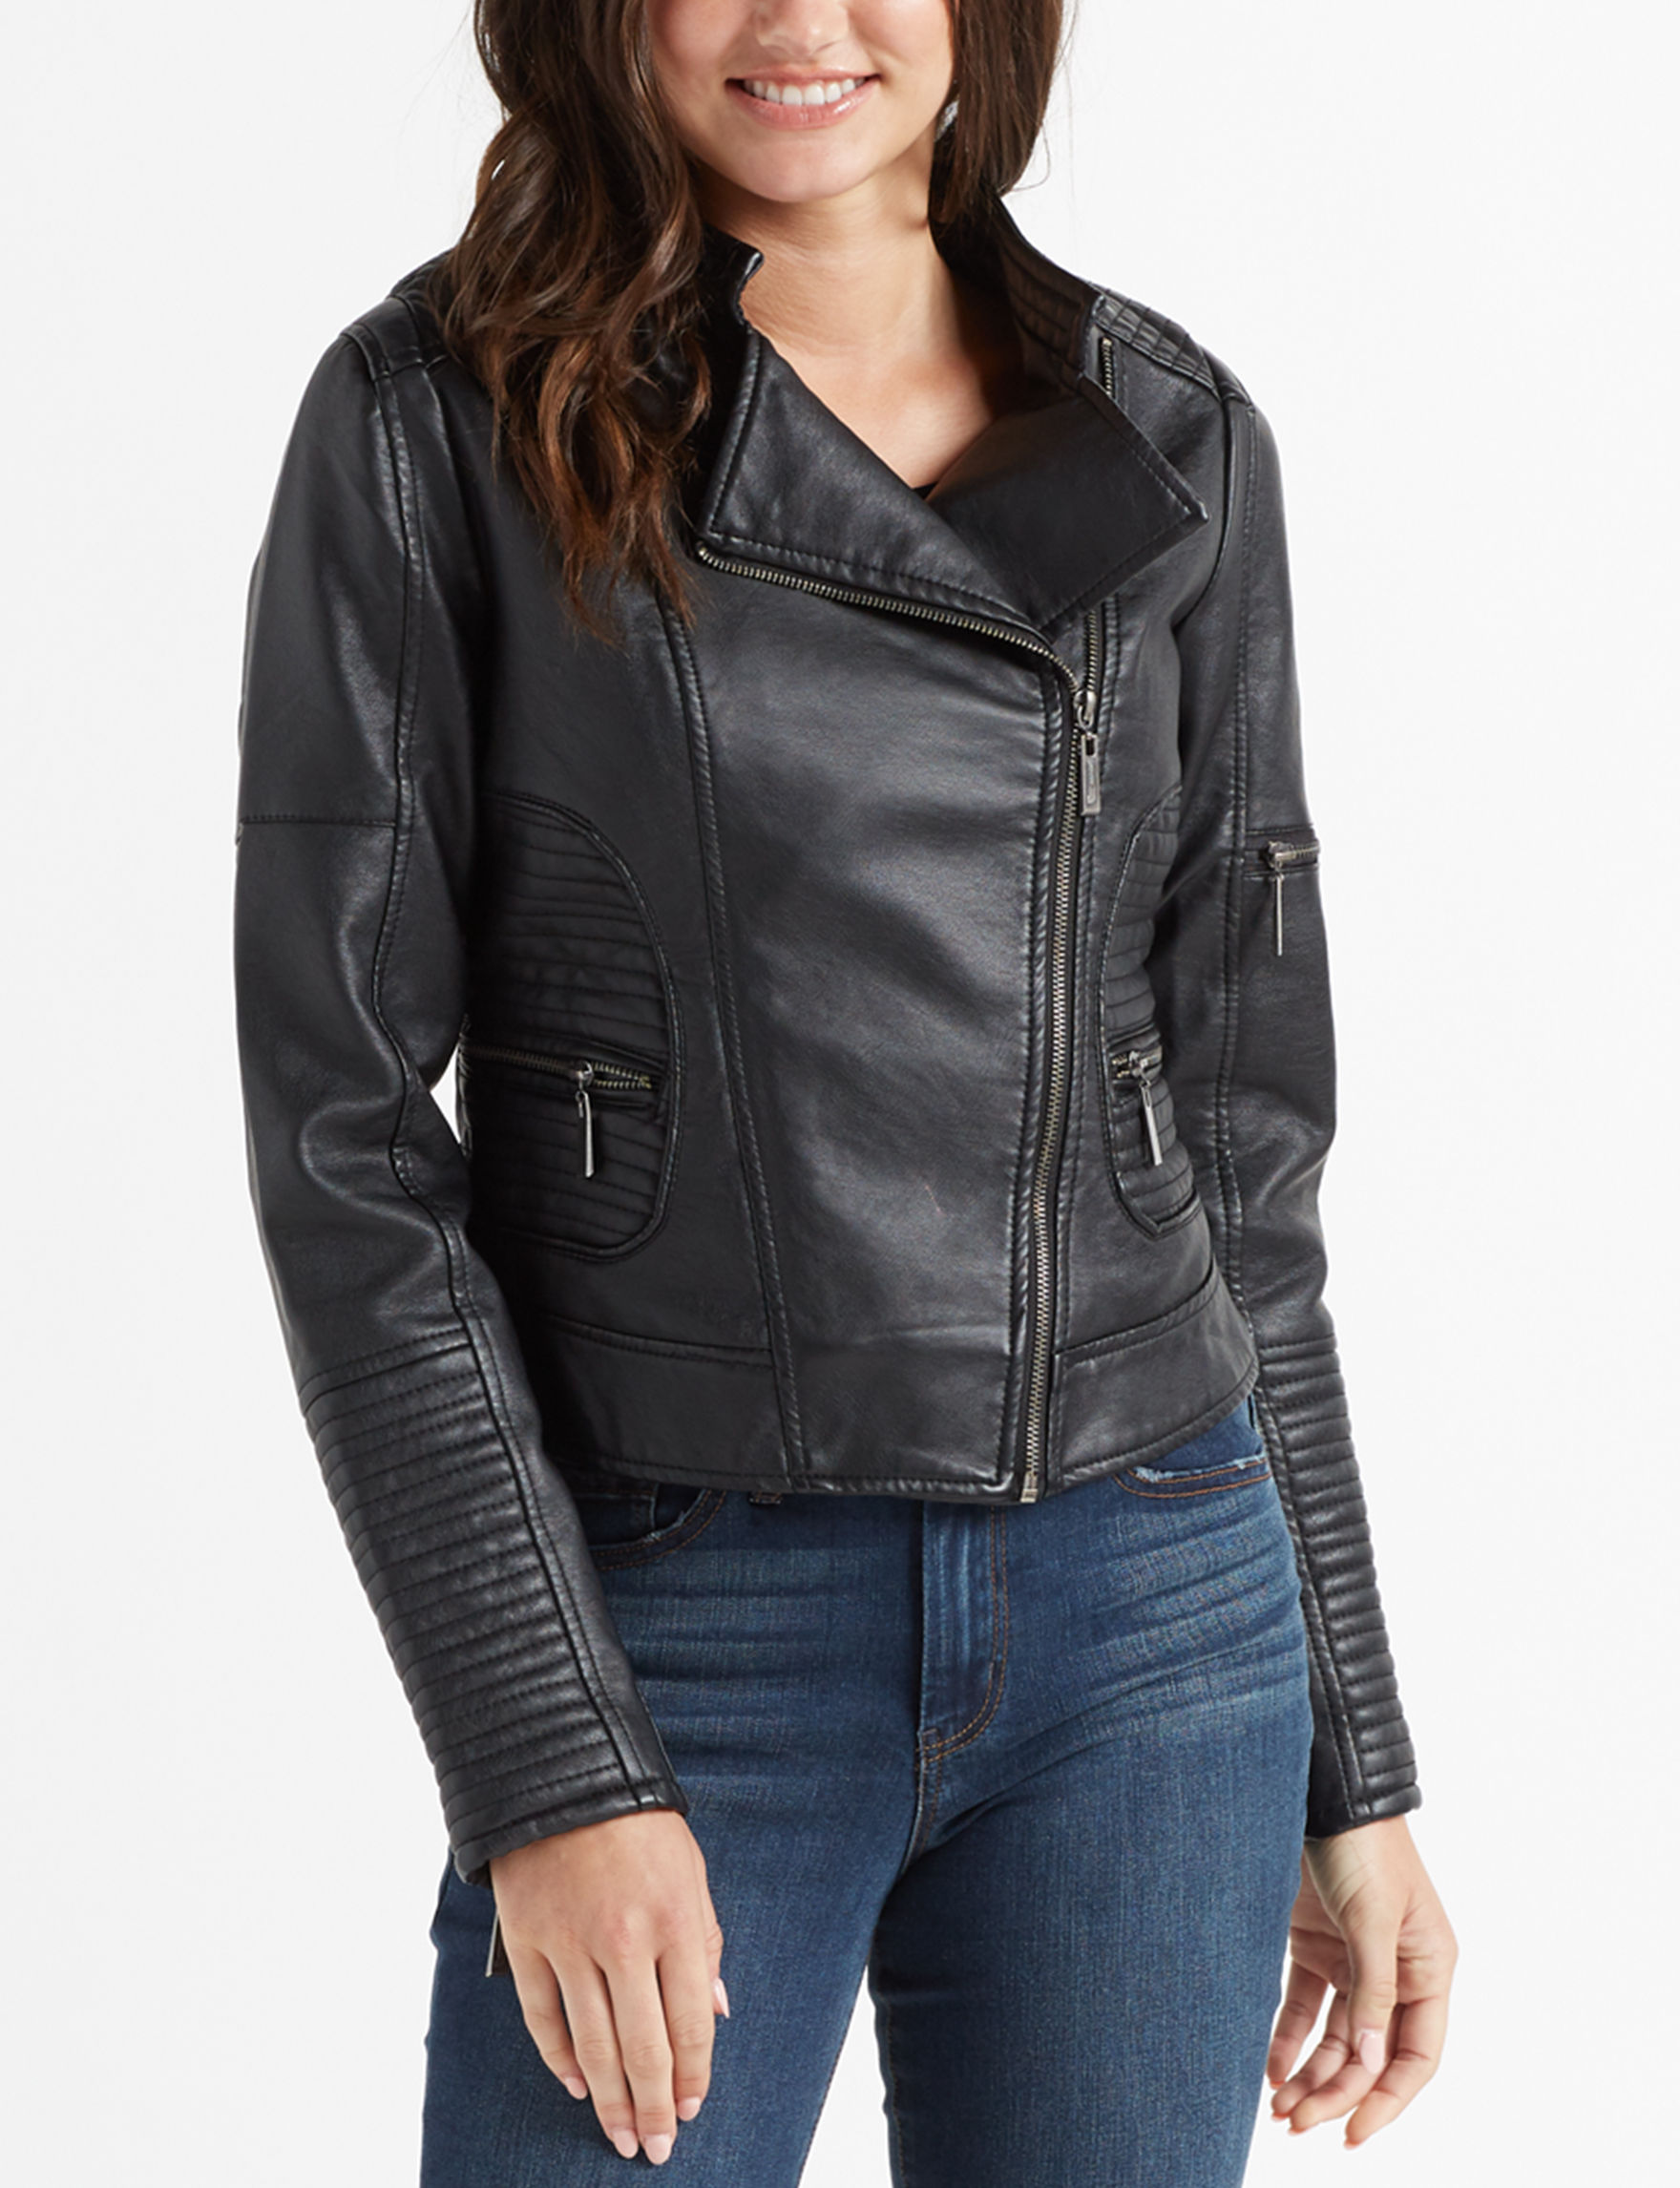 Jou-Jou Black Bomber & Moto Jackets